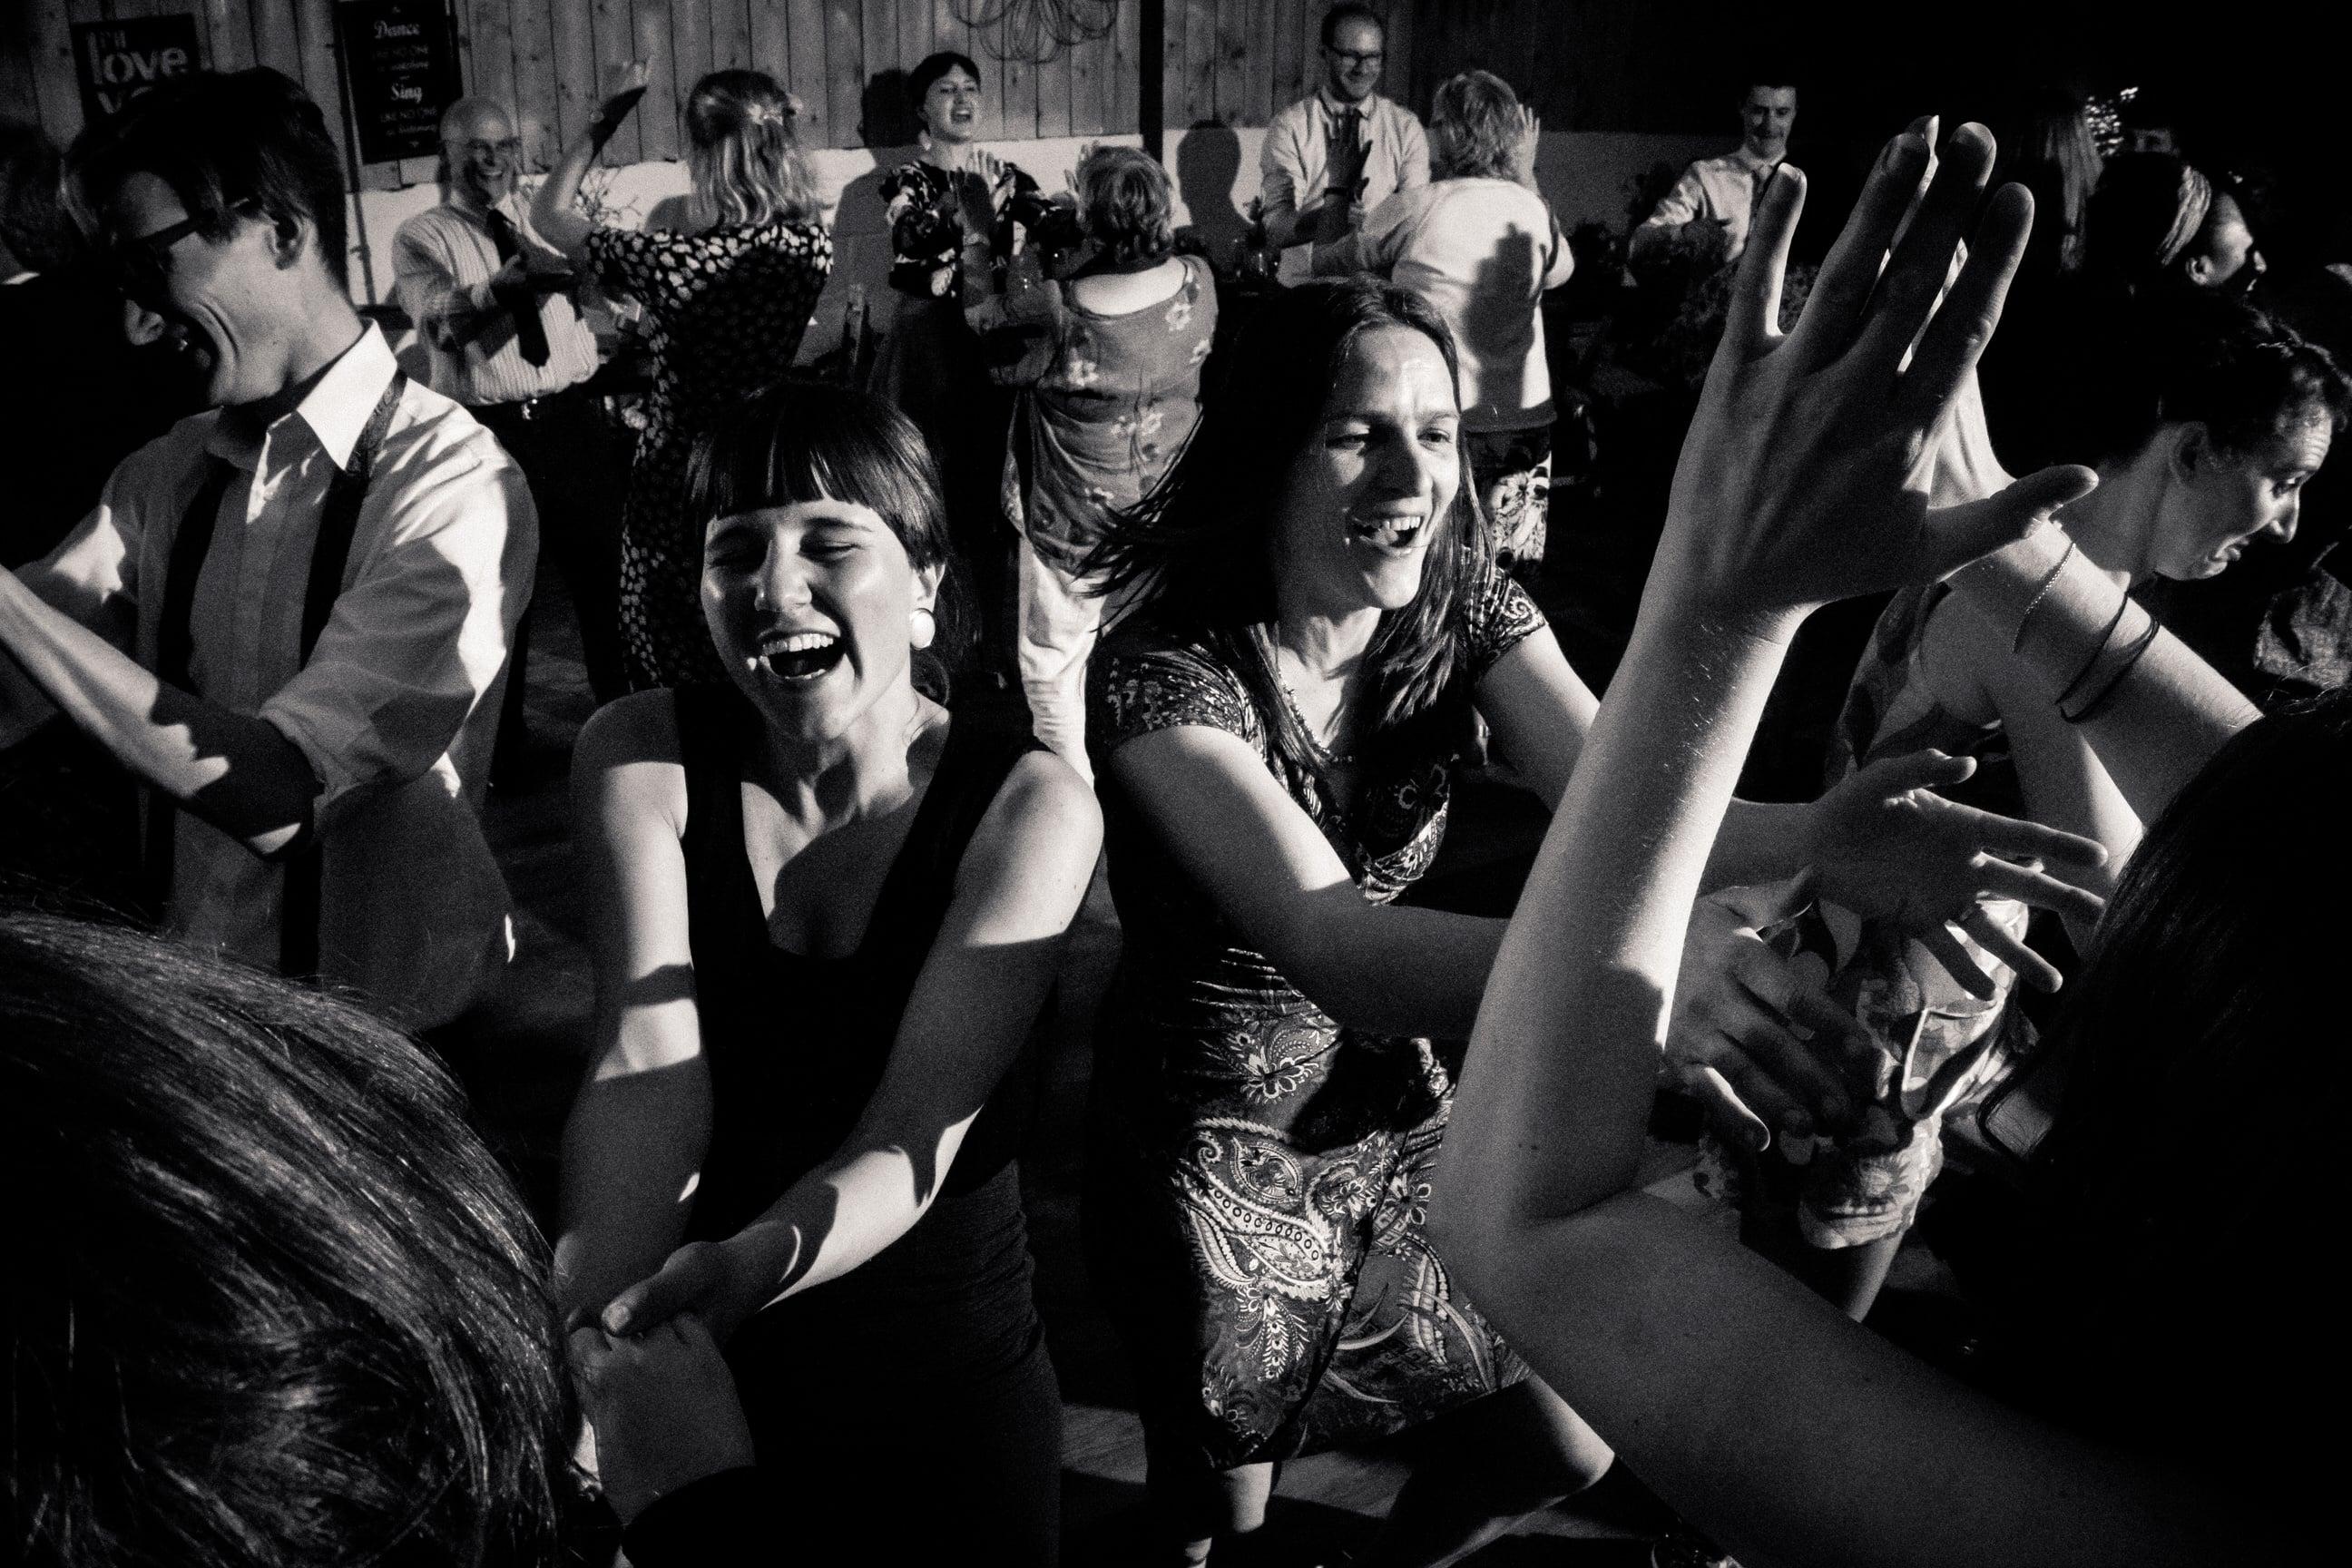 The_Wellbeing_Farm_Wedding-Knud&Sally-Chris_McGloin_Photography-846